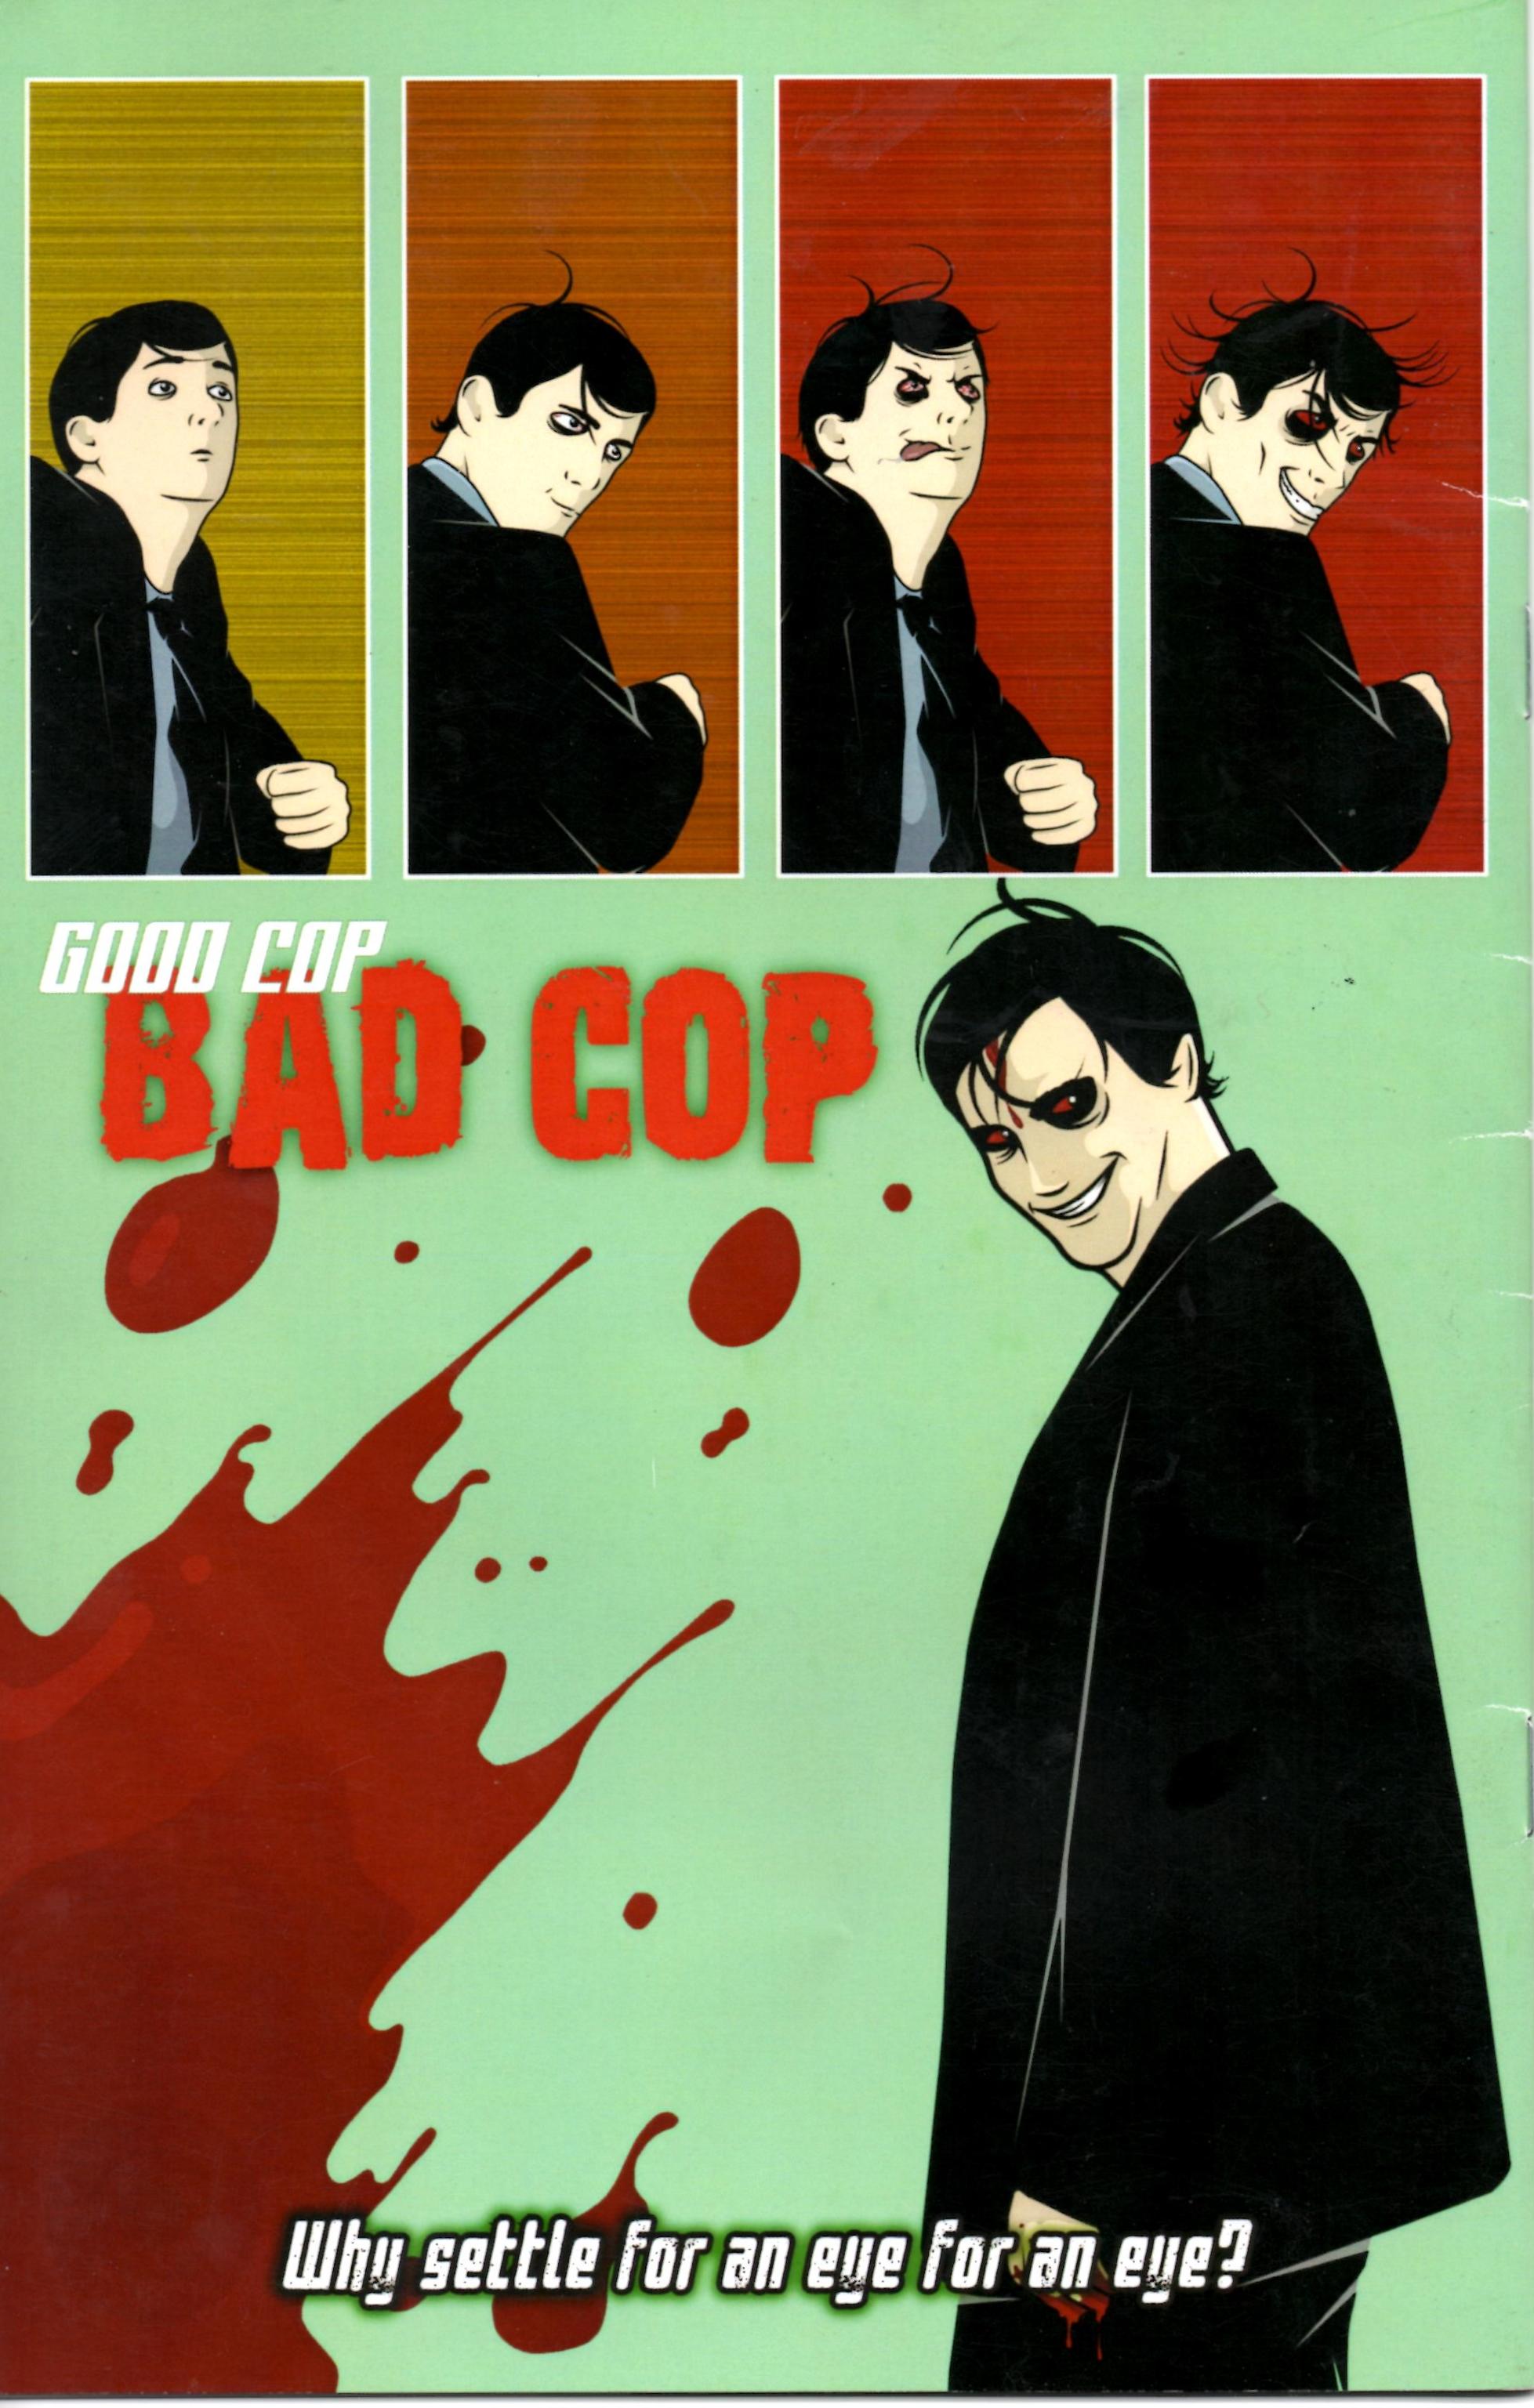 Good Cop, Bad Cop - story by Jim Alexander, art by Luke Cooper